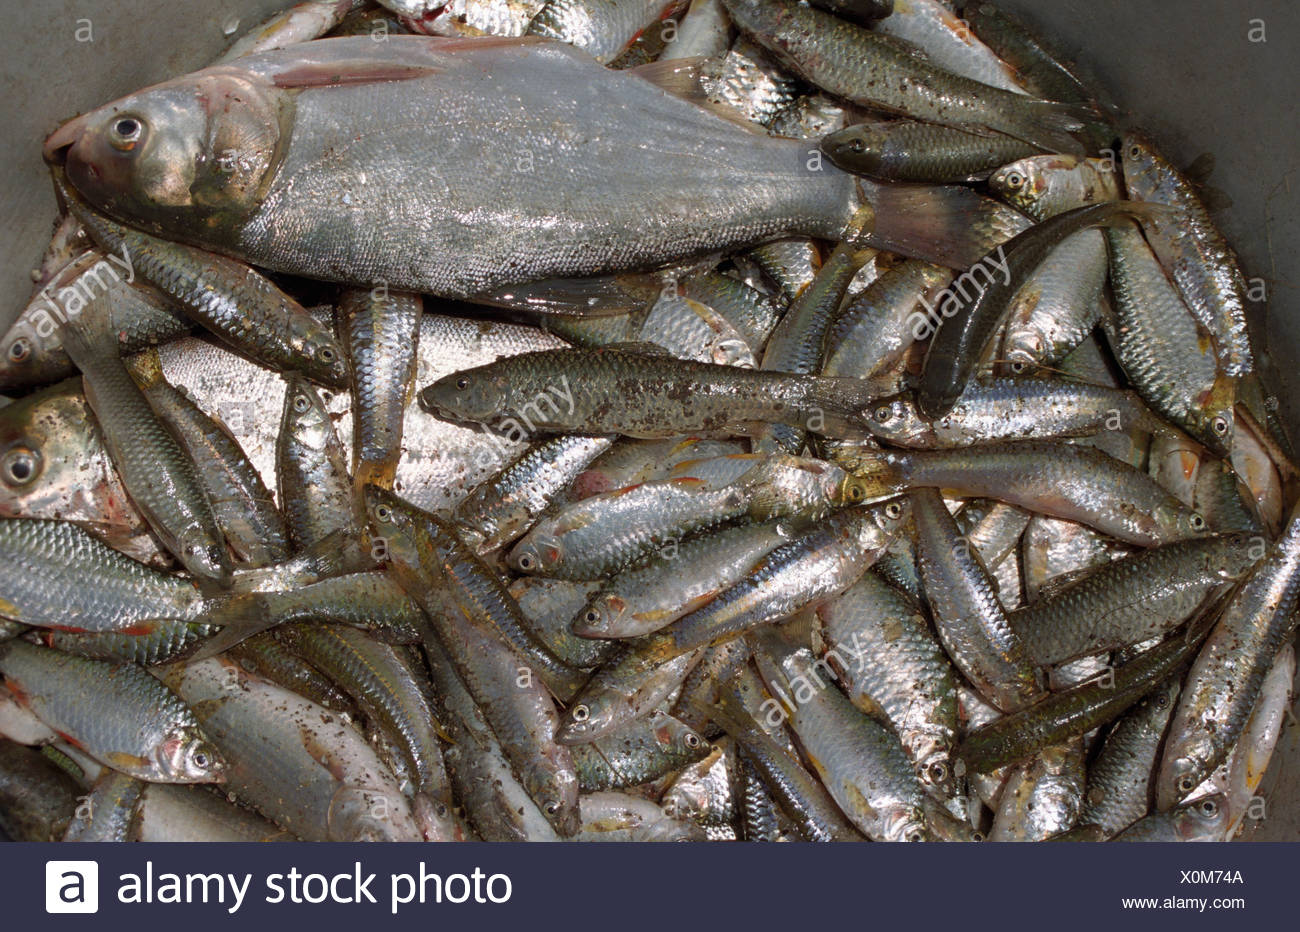 Fish catch from lake Talegoan, Pune India - Stock Image